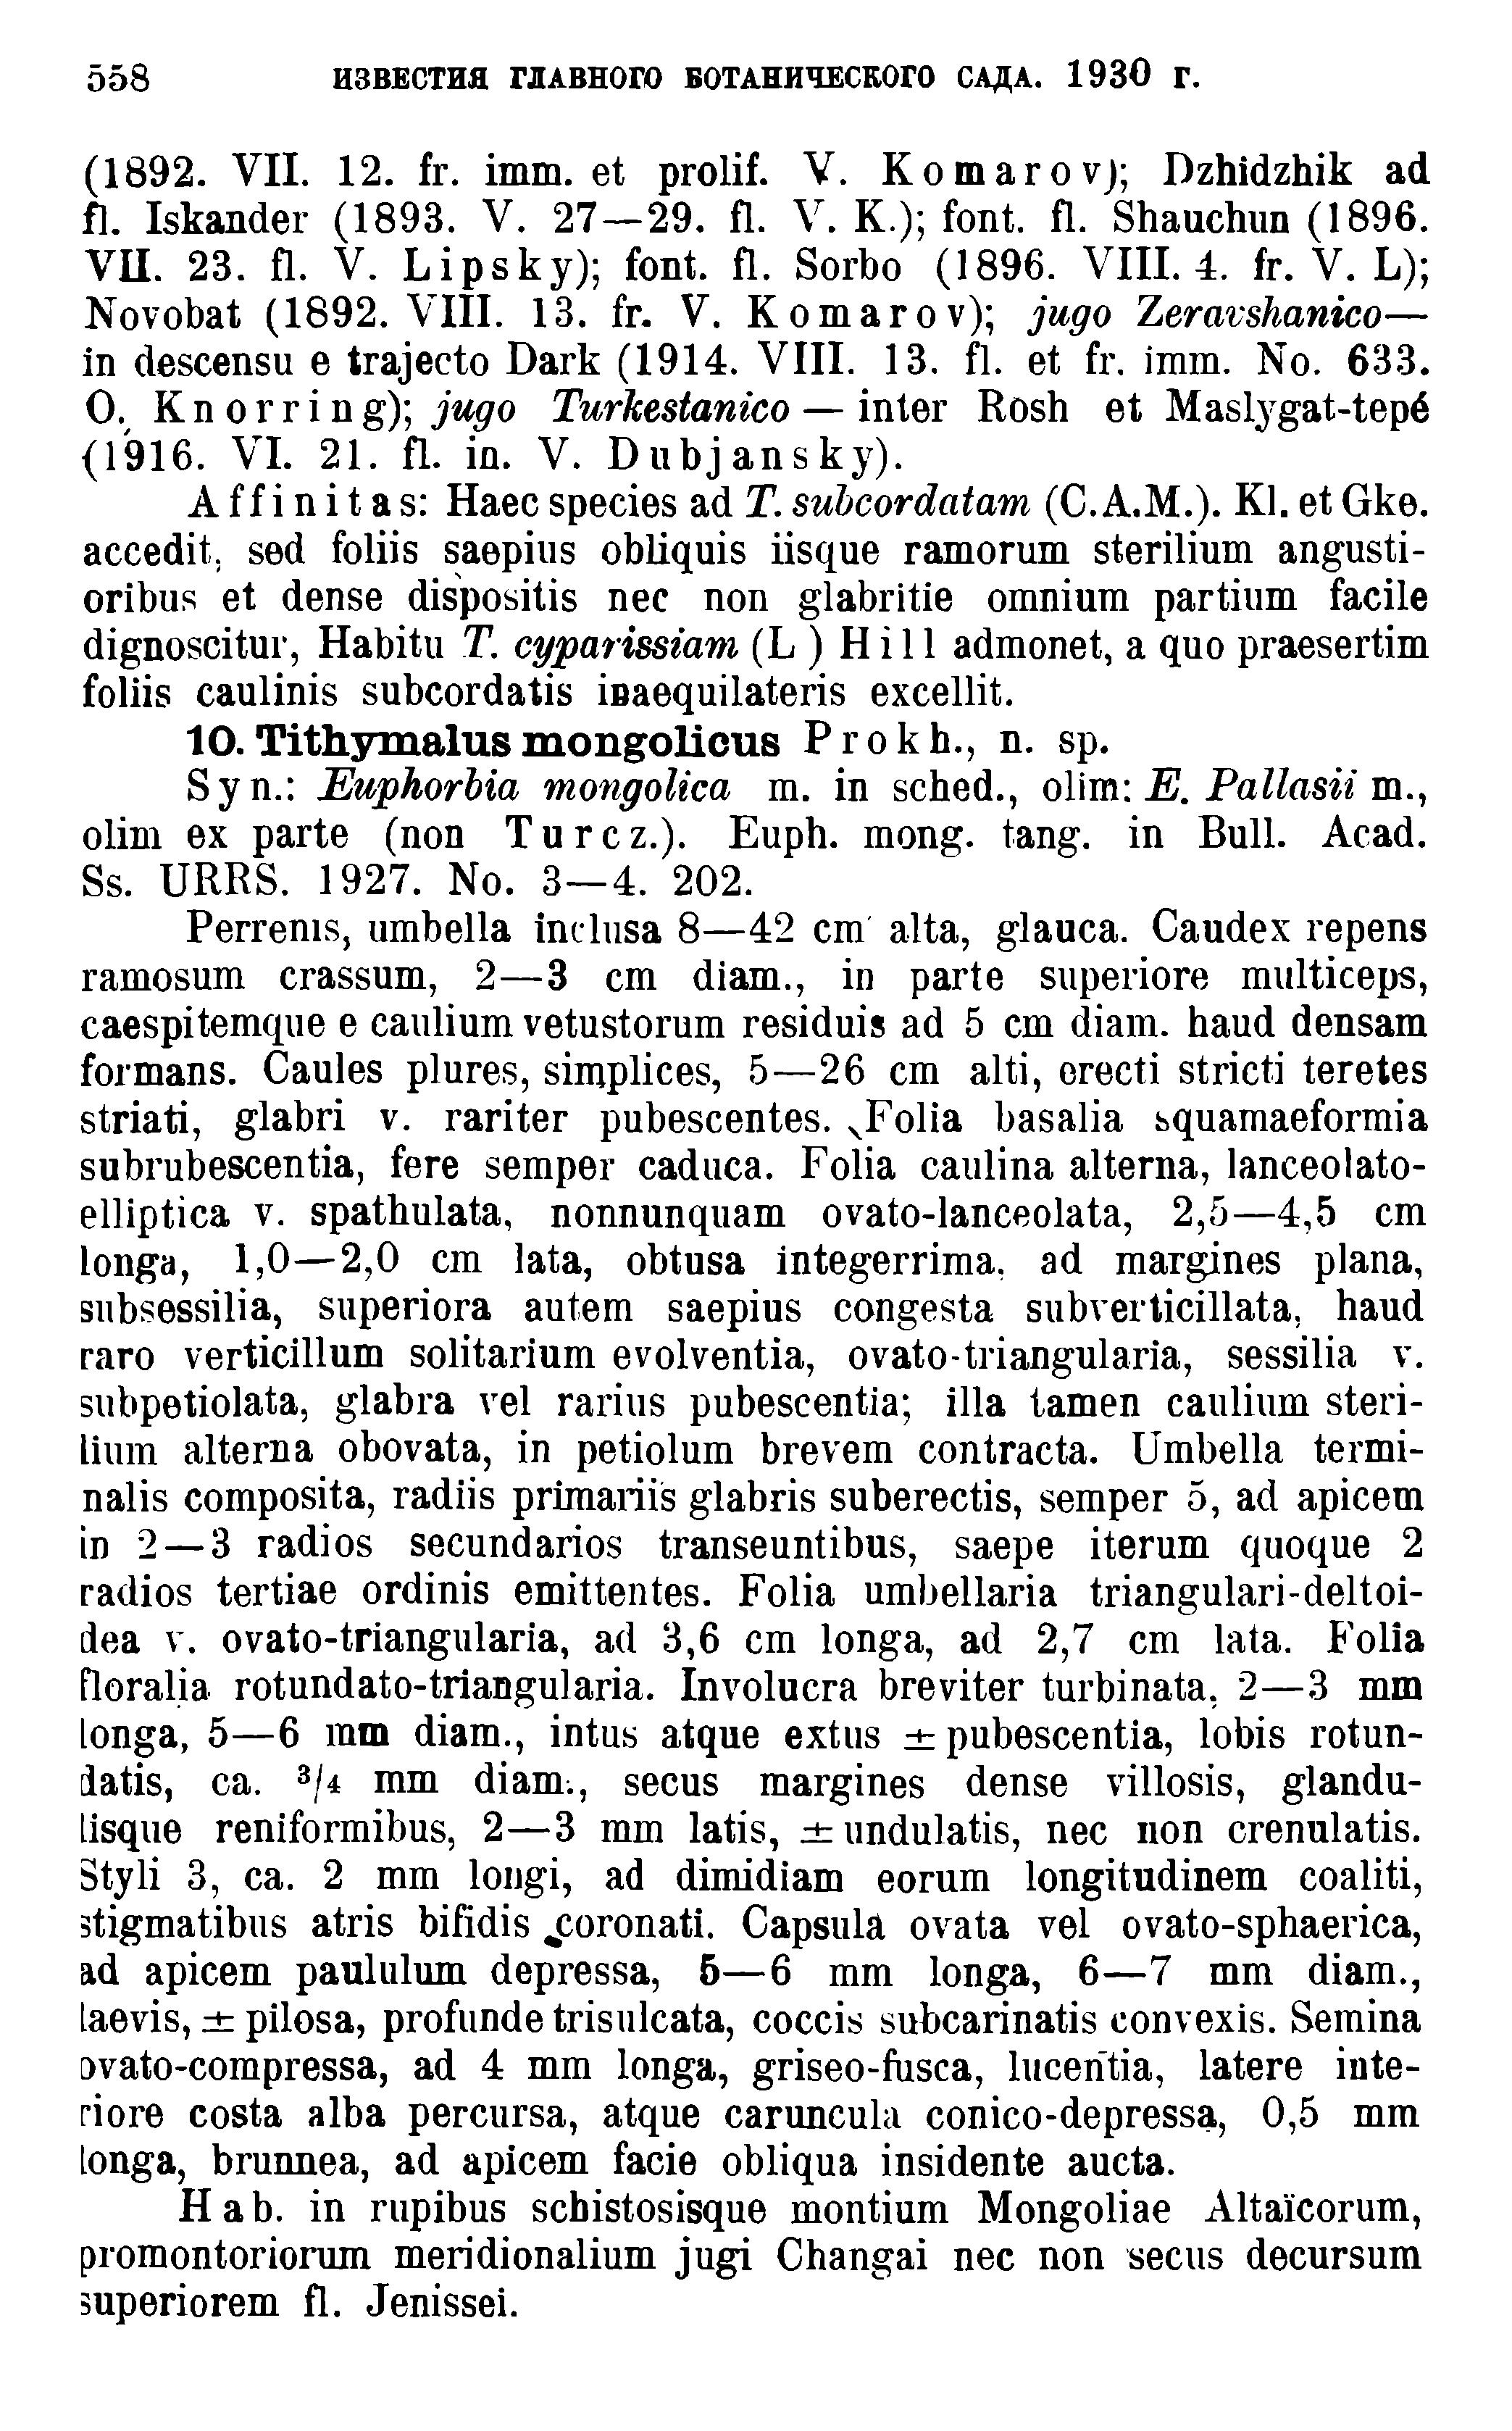 https://forum.plantarium.ru/misc.php?action=pun_attachment&item=30294&download=0